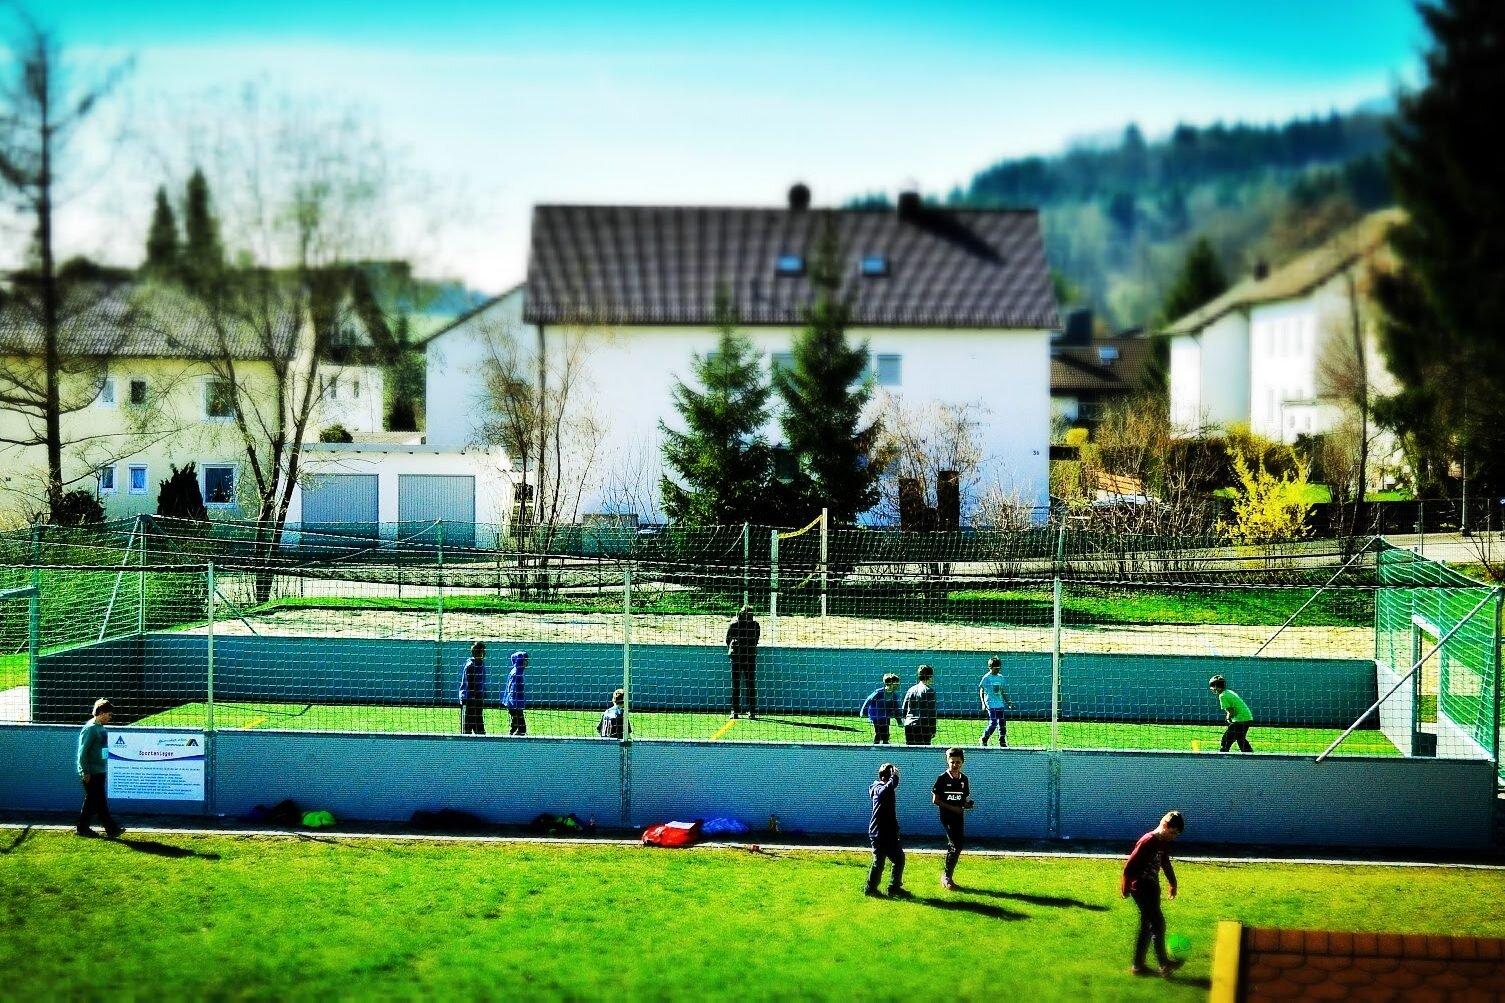 Soccercourt beim Fussball Trainingslager Allgaeu